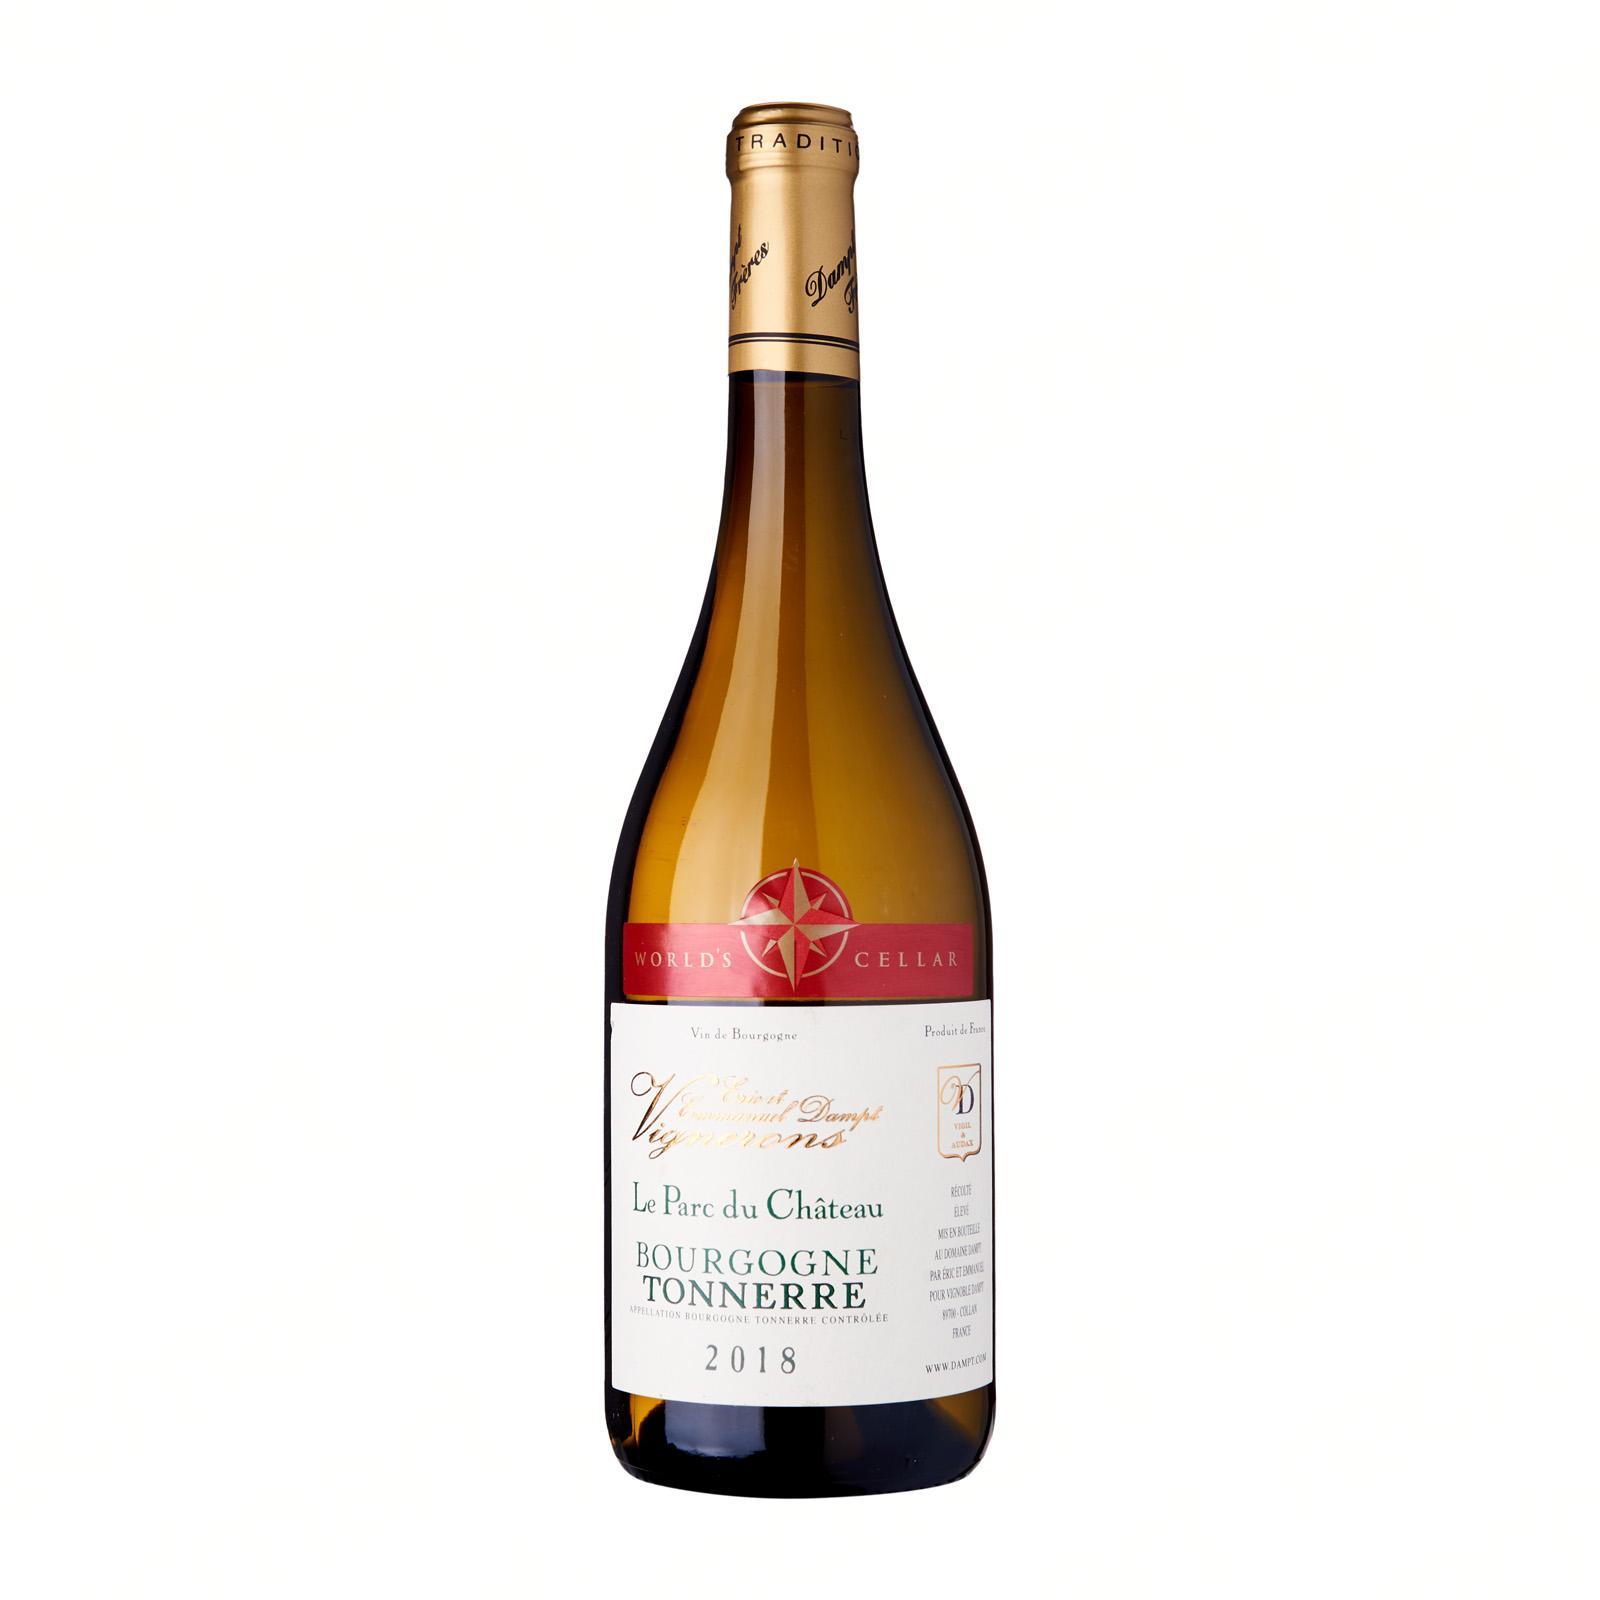 World's Cellar Bourgogne Tonnerre Blanc Parc du Chateau White Wine